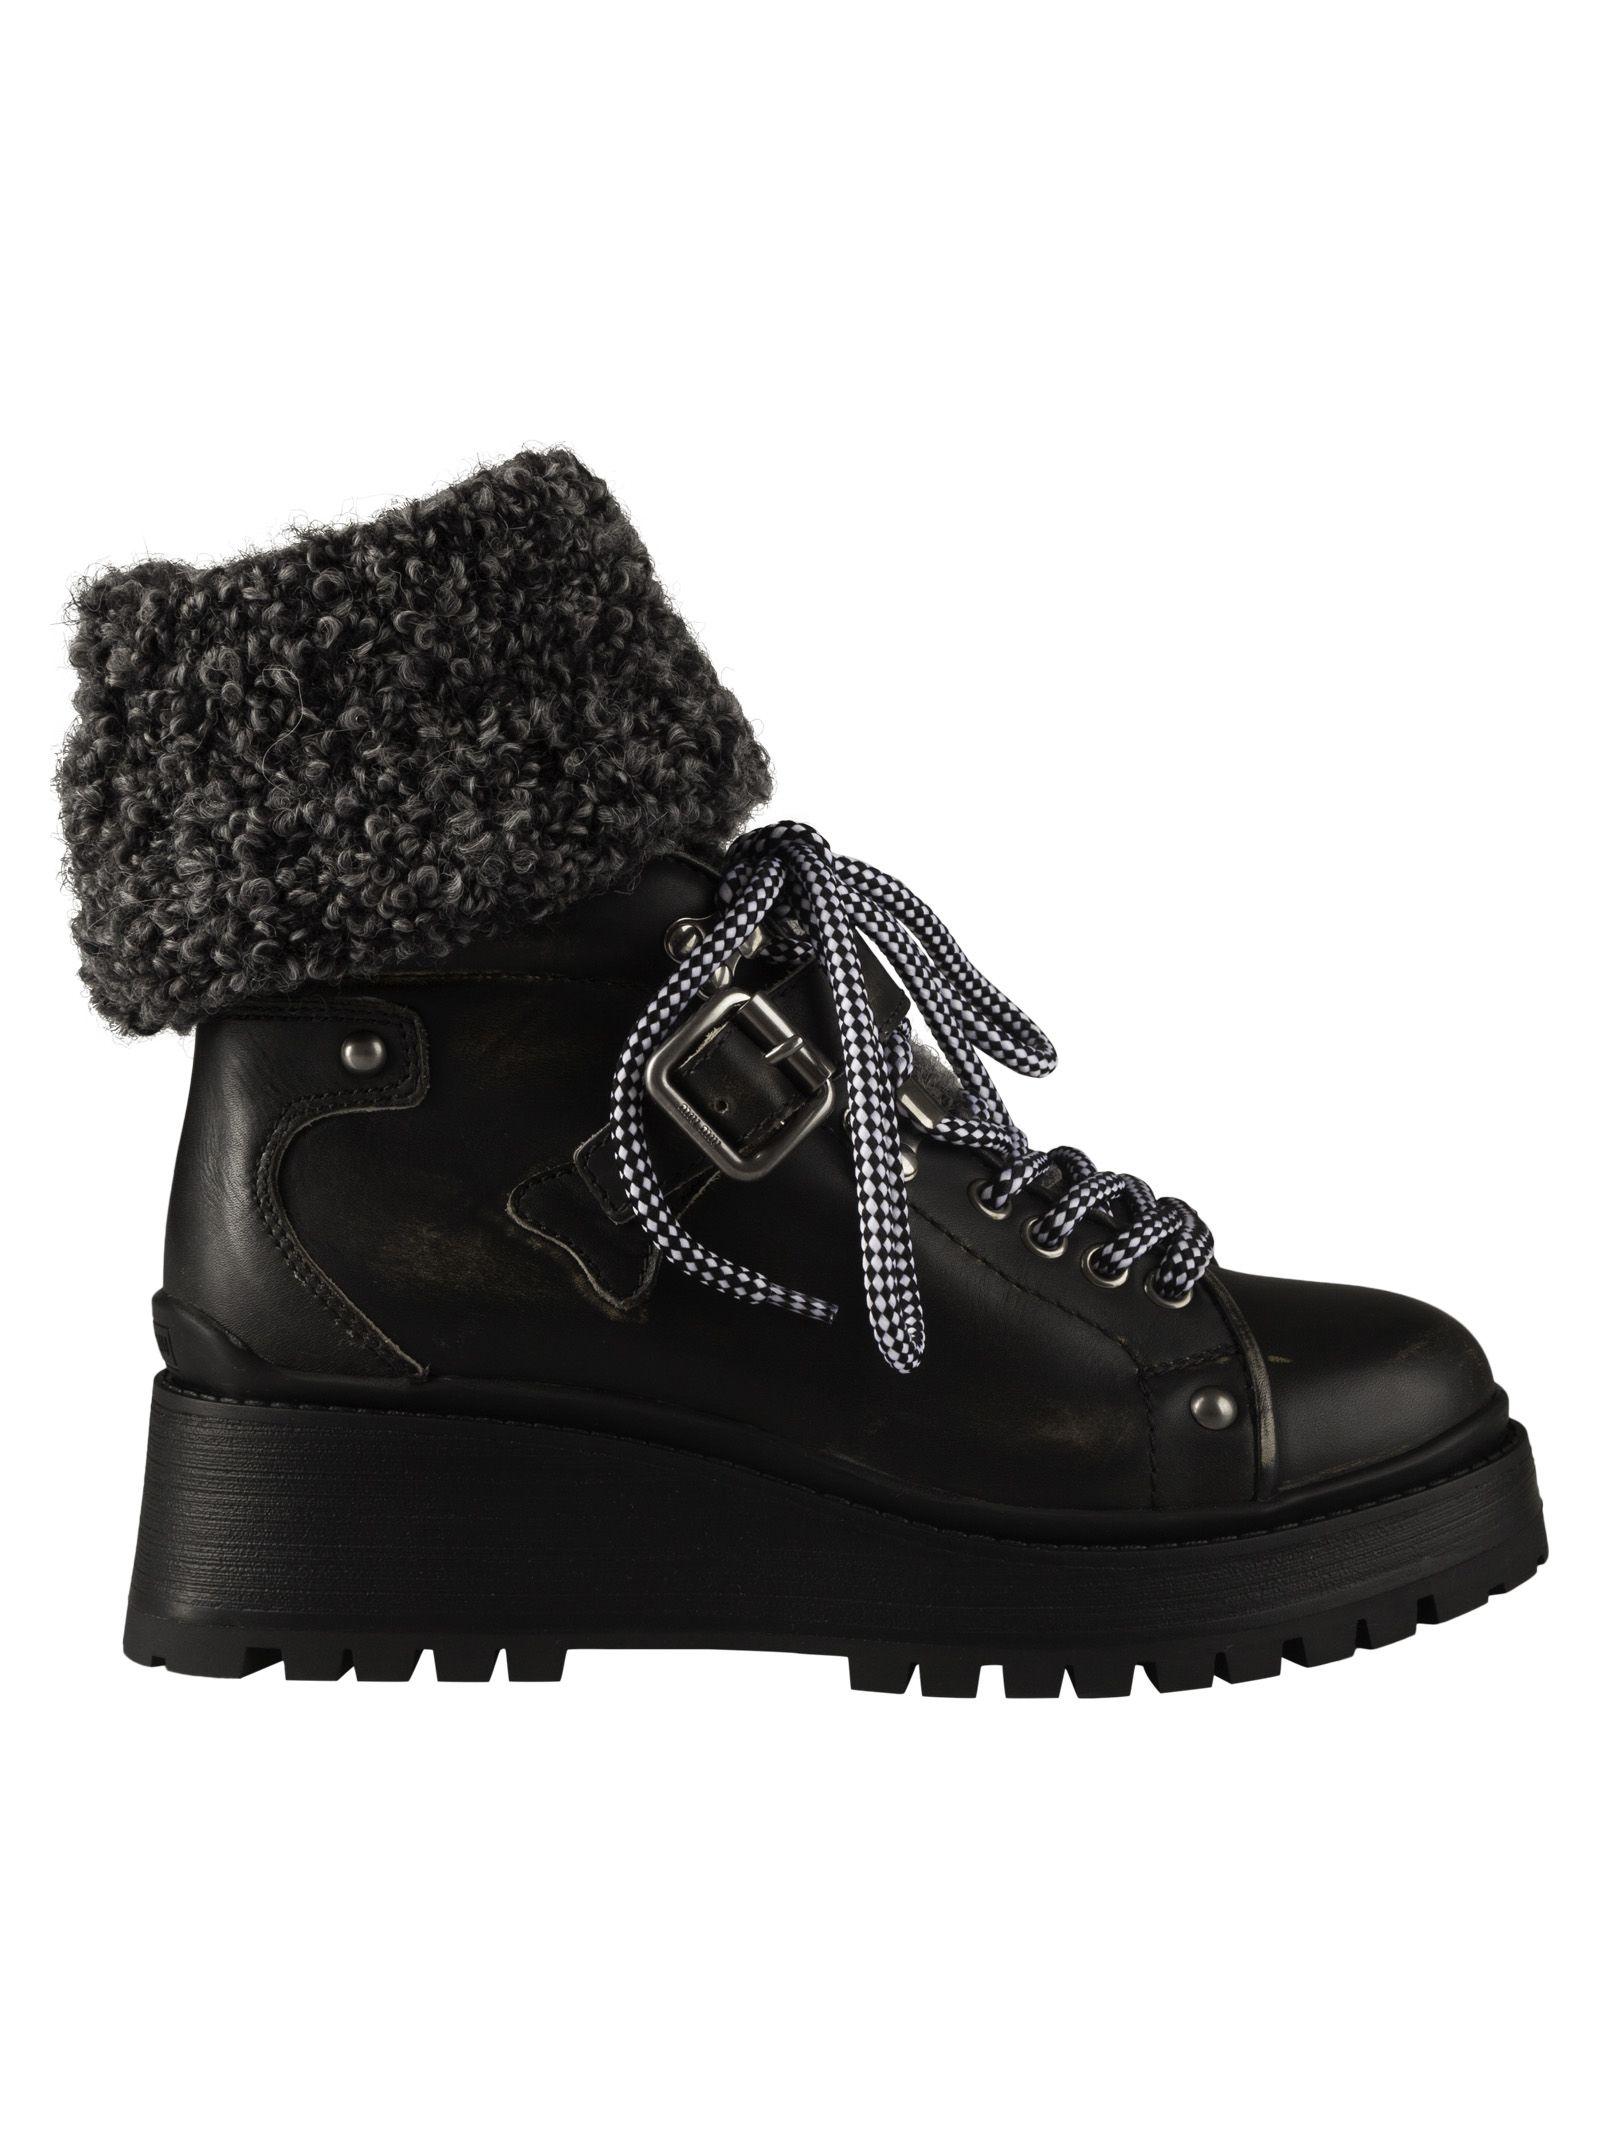 miu miu -  Buckled Ankle Boots